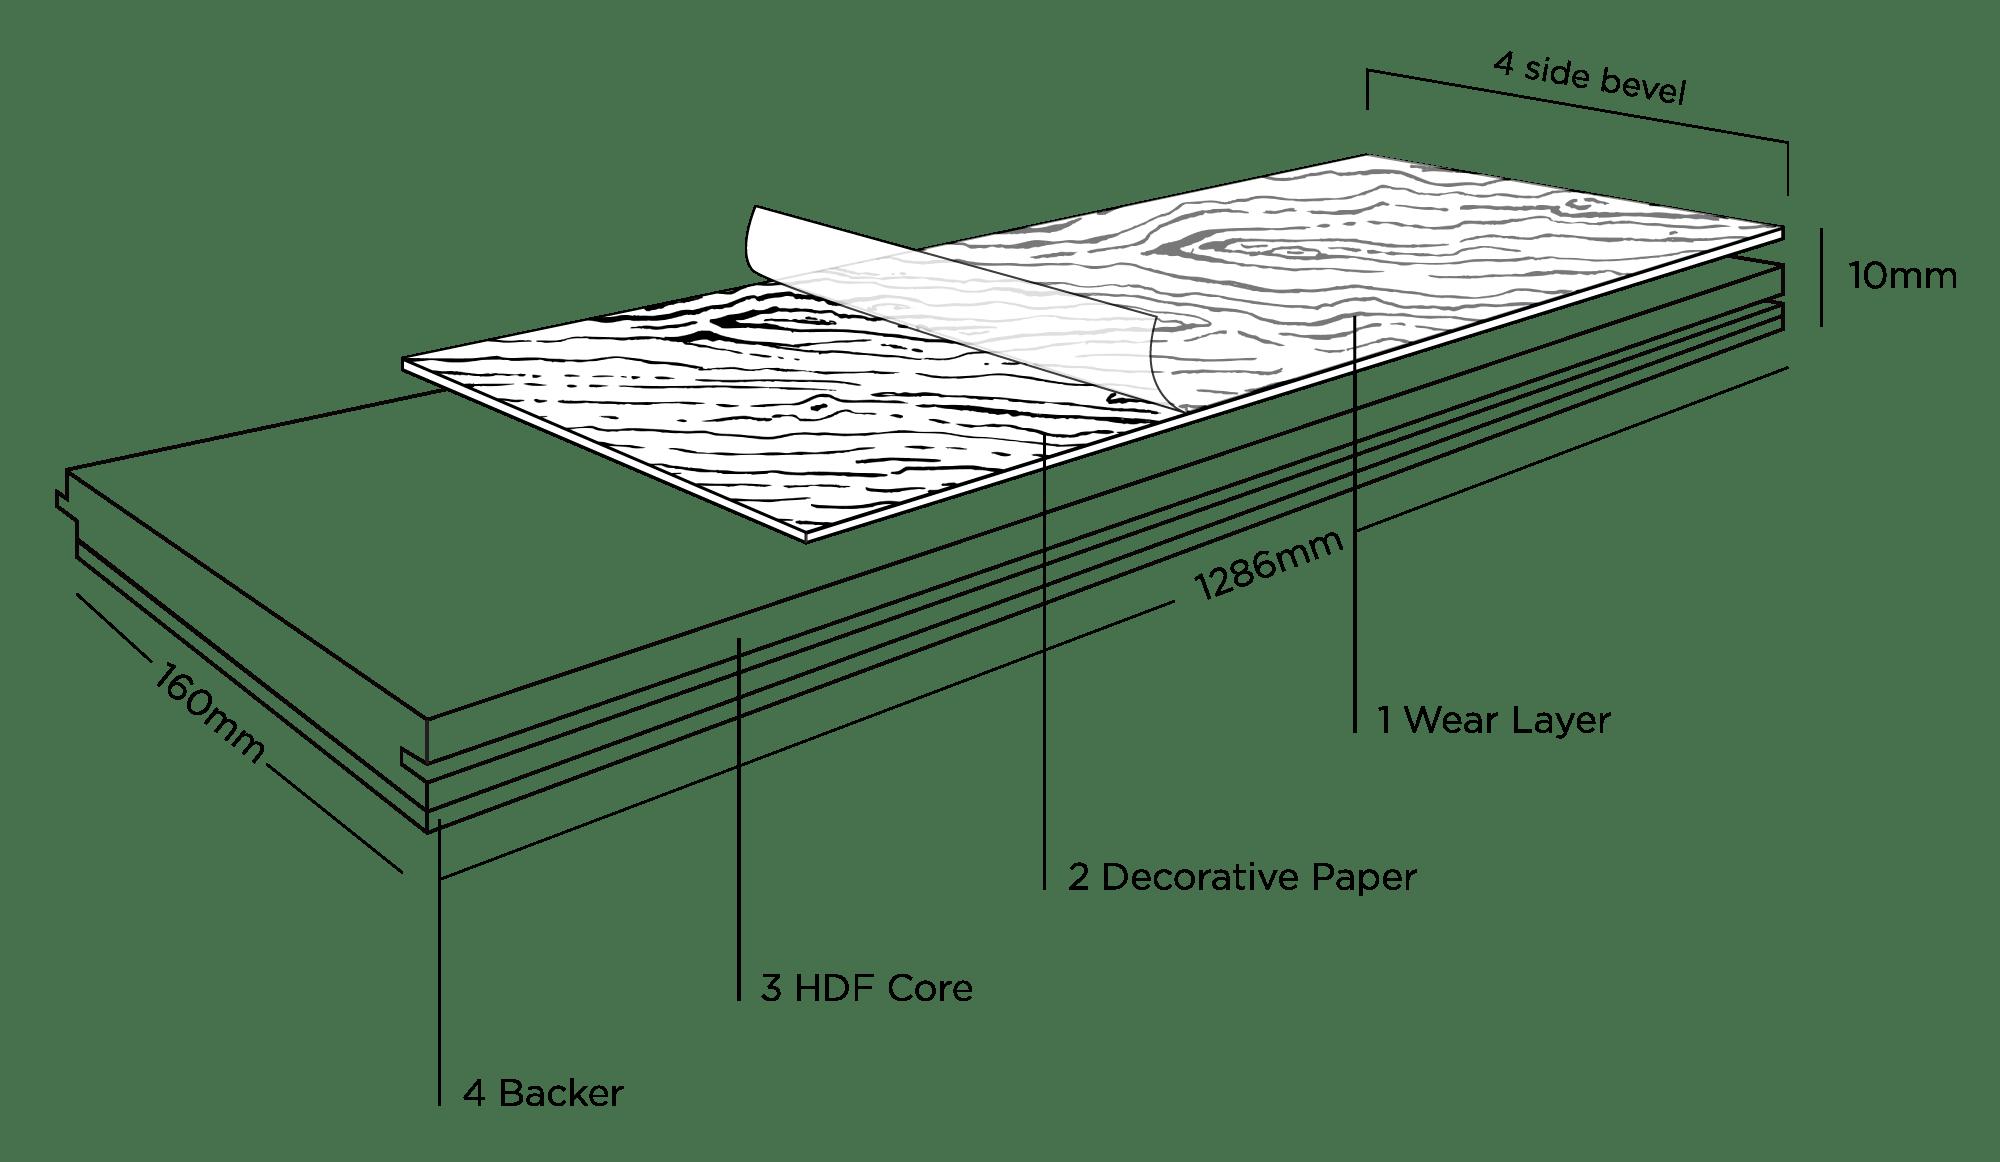 4 Layers Of Laminate Flooring